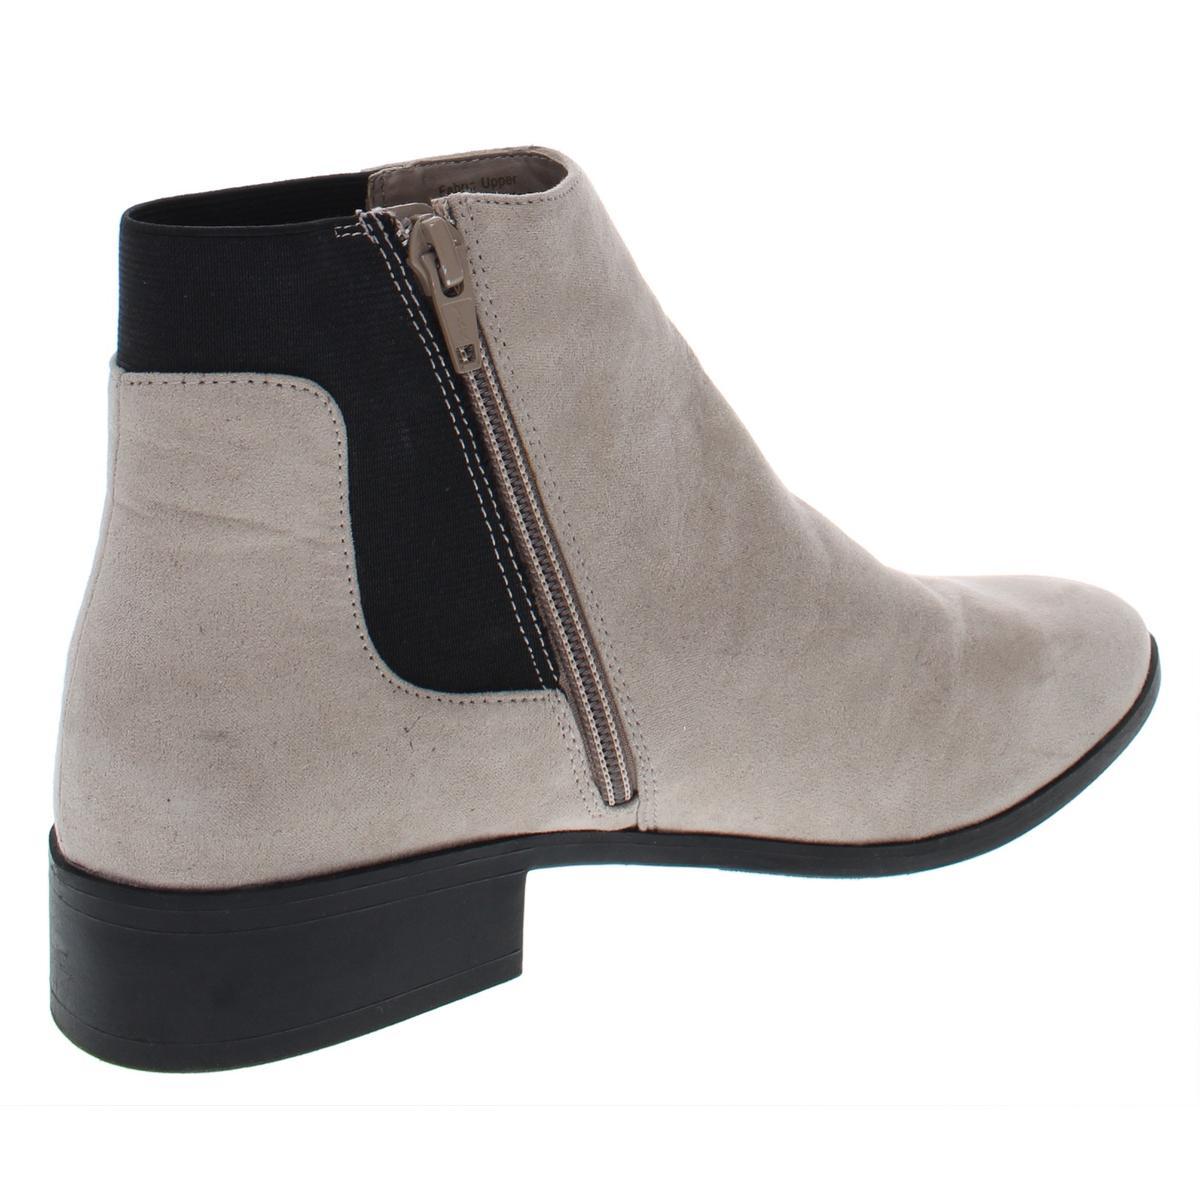 Bar III Womens Gala Ankle Fashion Booties Shoes BHFO 2555